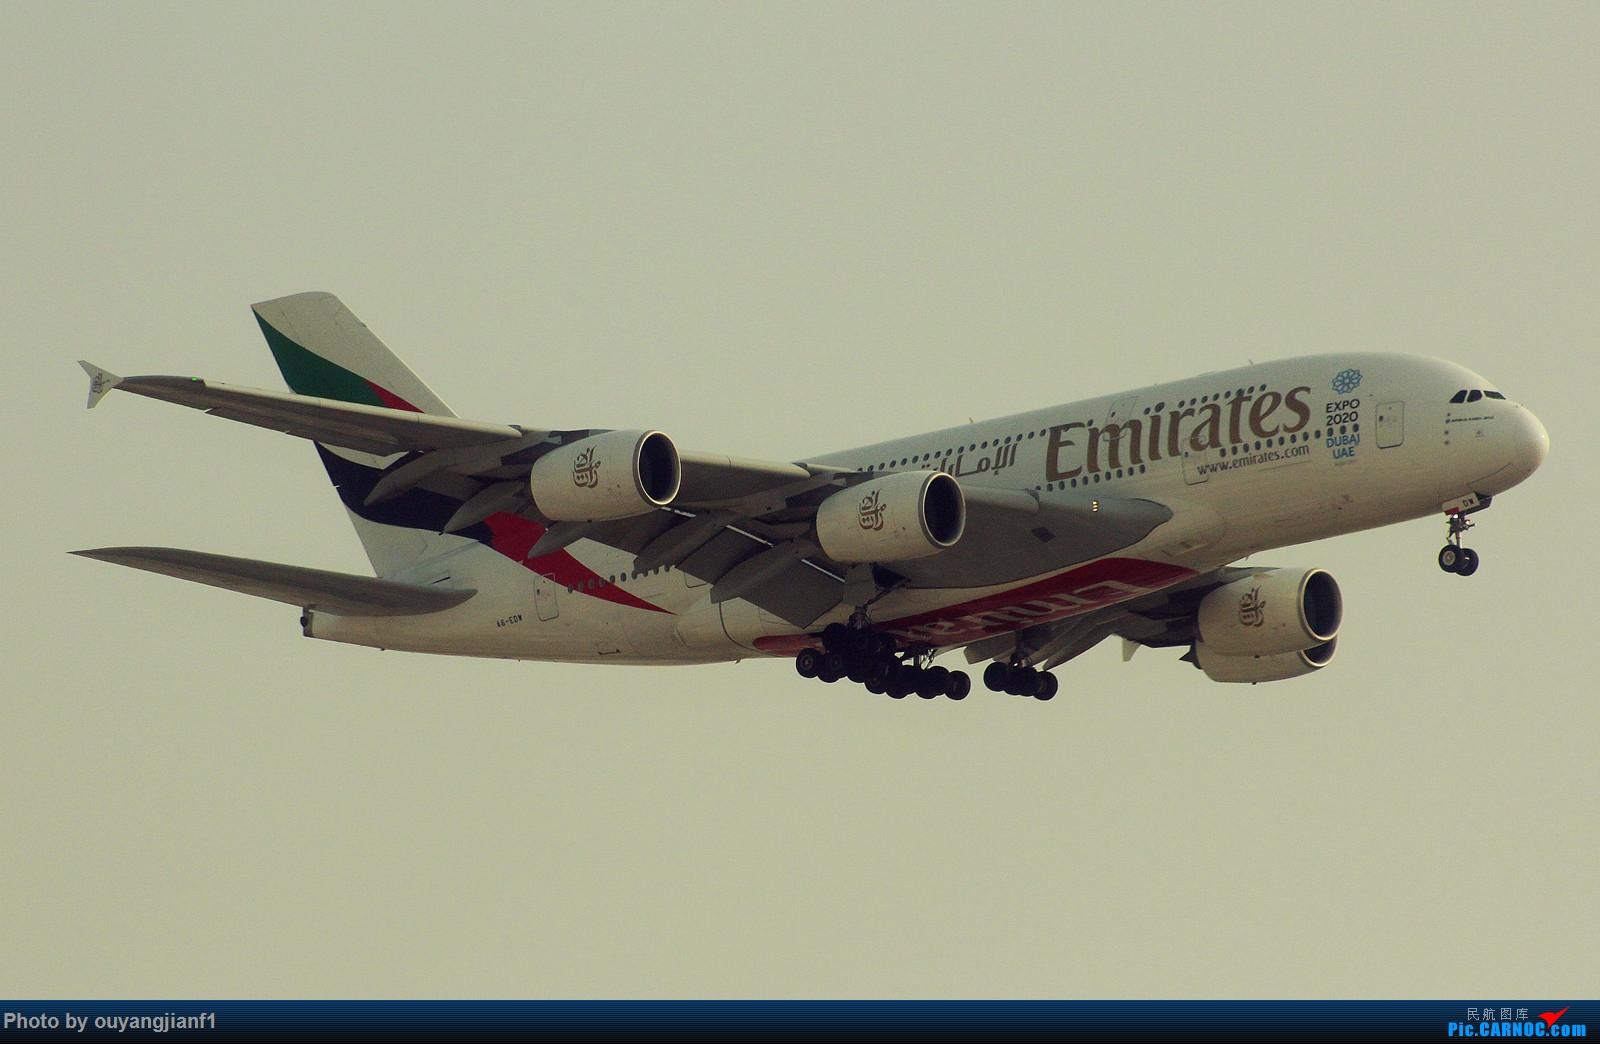 Re:[原创]很多年没有来贴图区了,记一次本不在计划中的迪拜拍机之行,在漫天黄沙中EK的380和777真的看到吐血.... AIRBUS A380-800 A6-EDW 阿拉伯联合酋长国迪拜国际机场